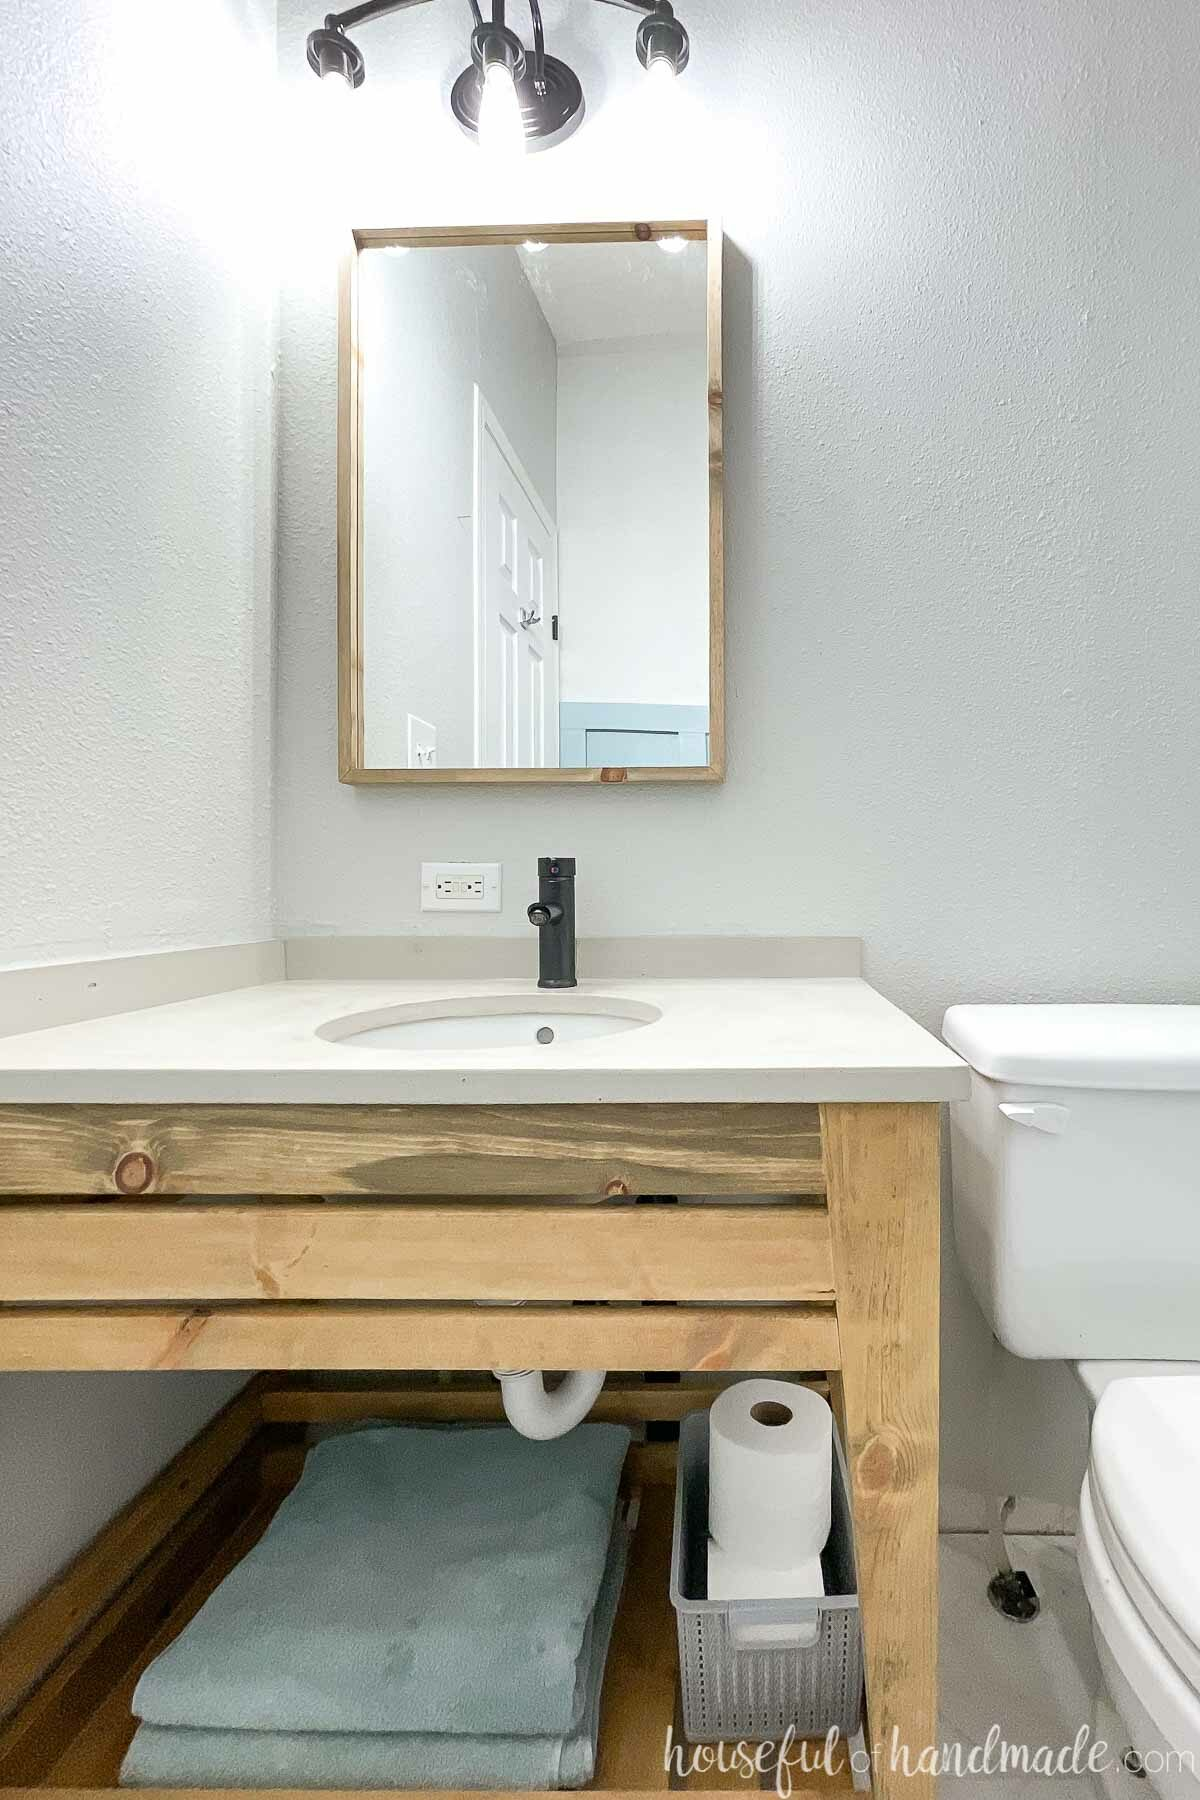 Open modern wood bathroom vanity with concrete vanity top, thin wood framed mirror and black fixtures in a bathroom.